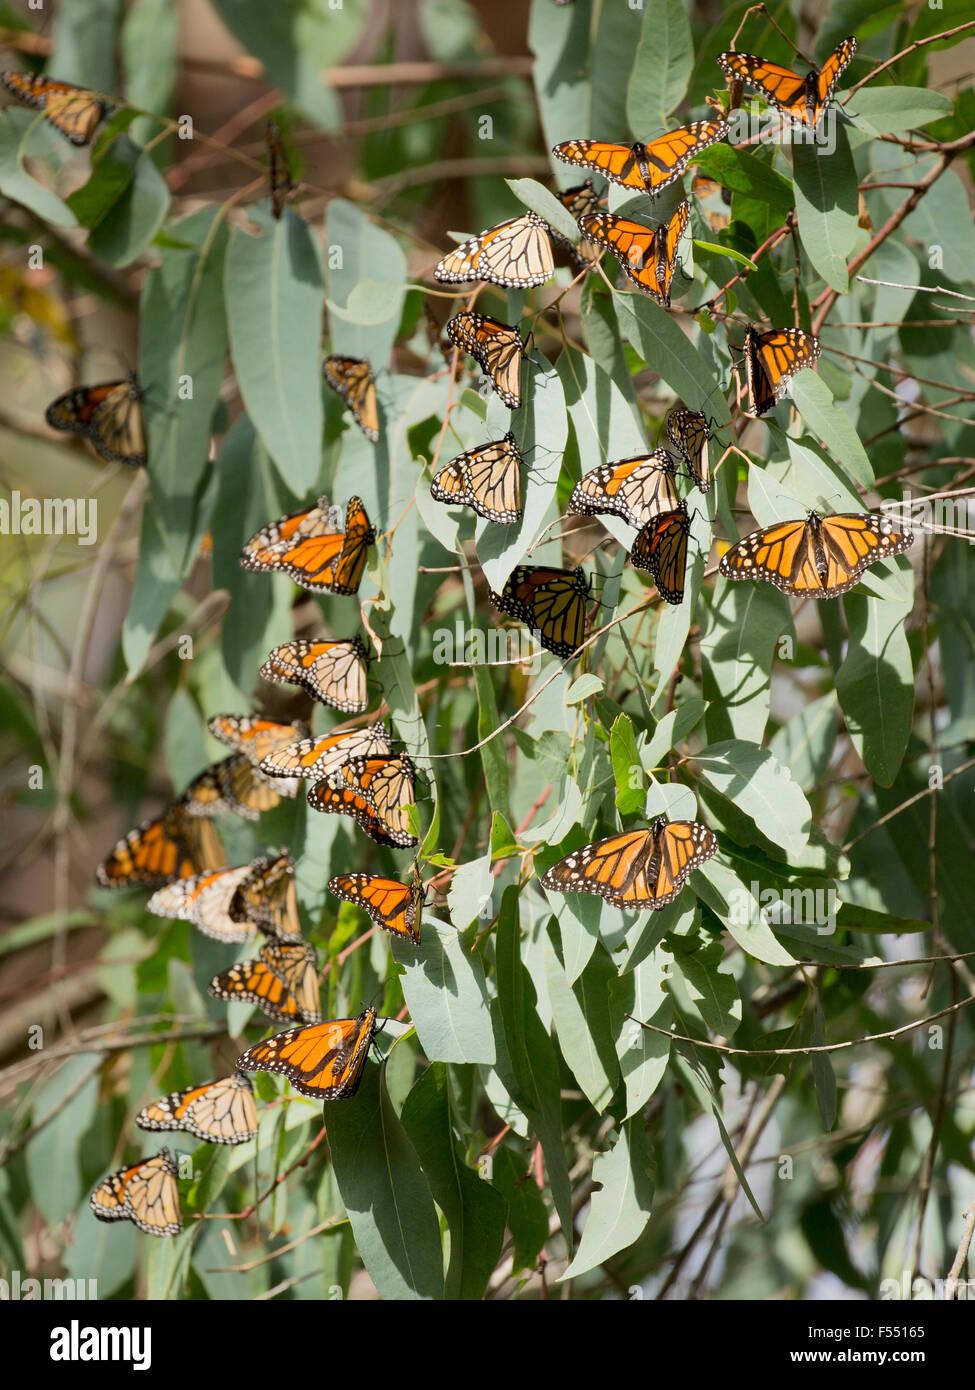 Monarch Butterflies (Danaus plexippus) - Stock Image